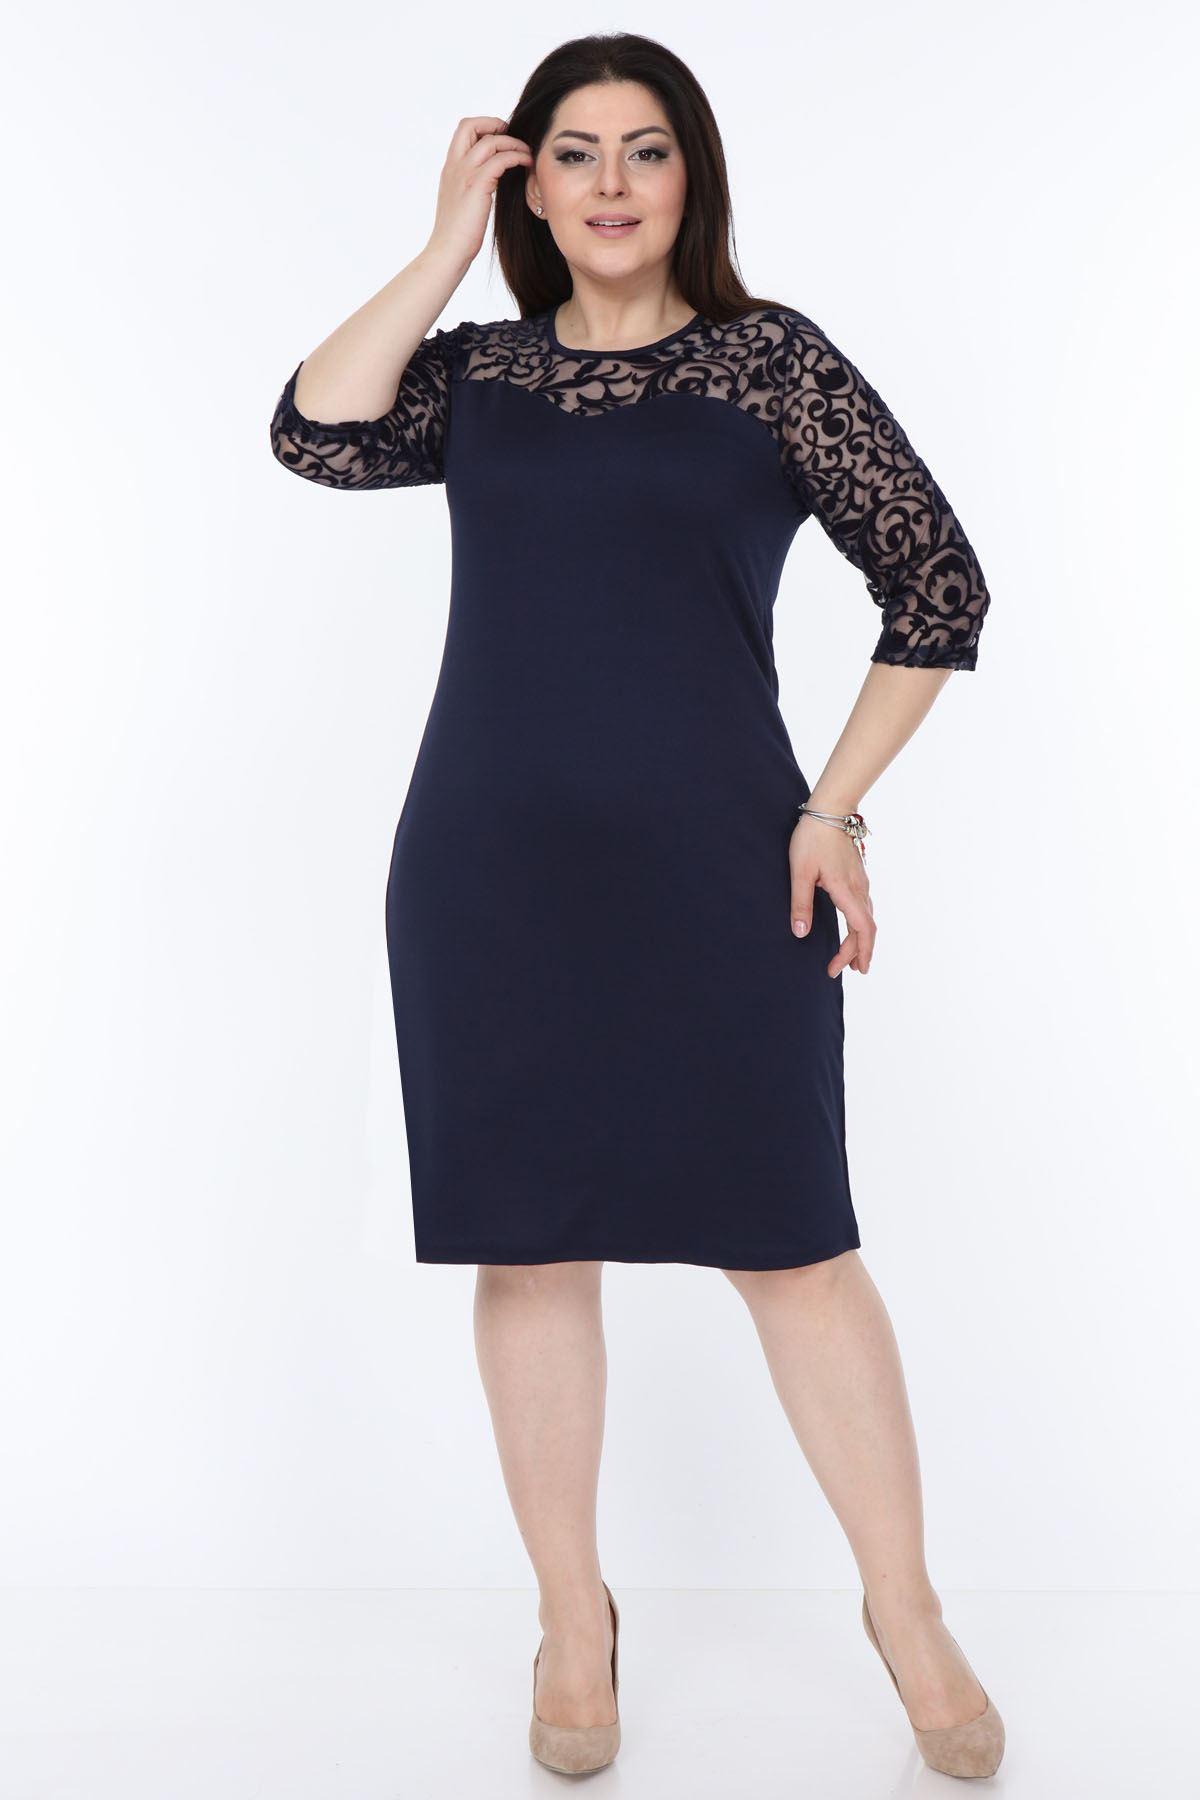 Lacivert Floklu Büyük Beden Elbise 2B-1032